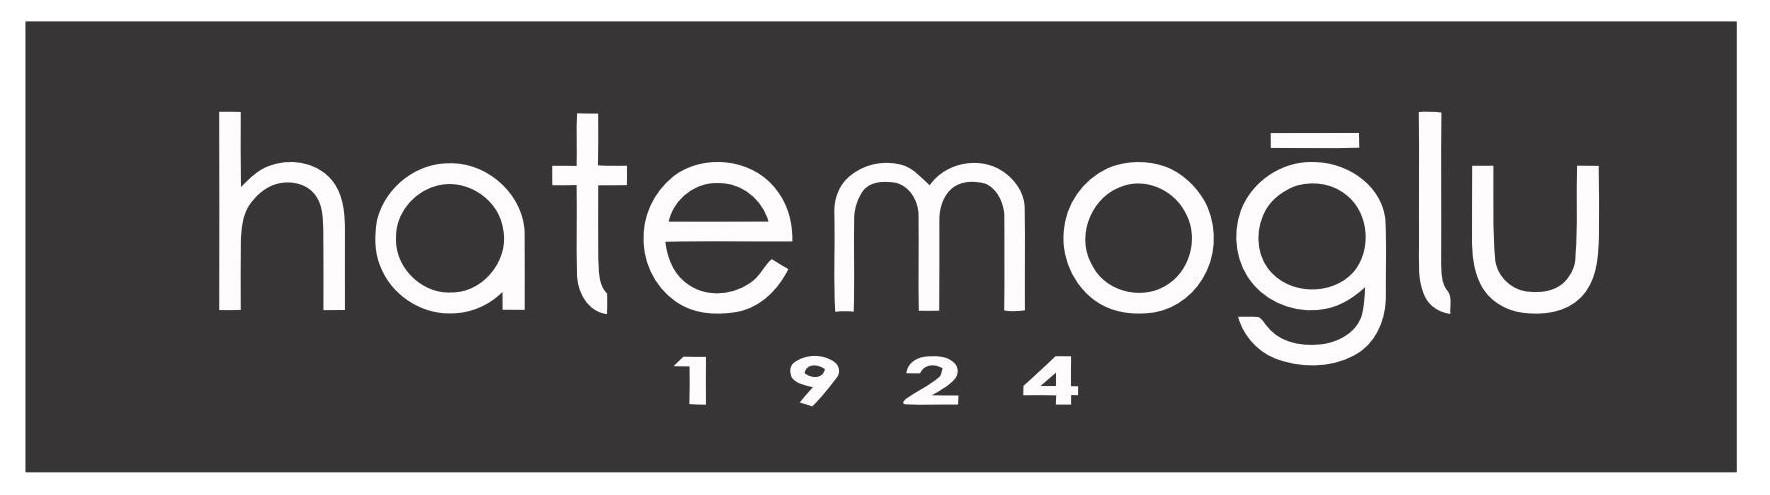 Hatemoğlu Logo [PDF] png